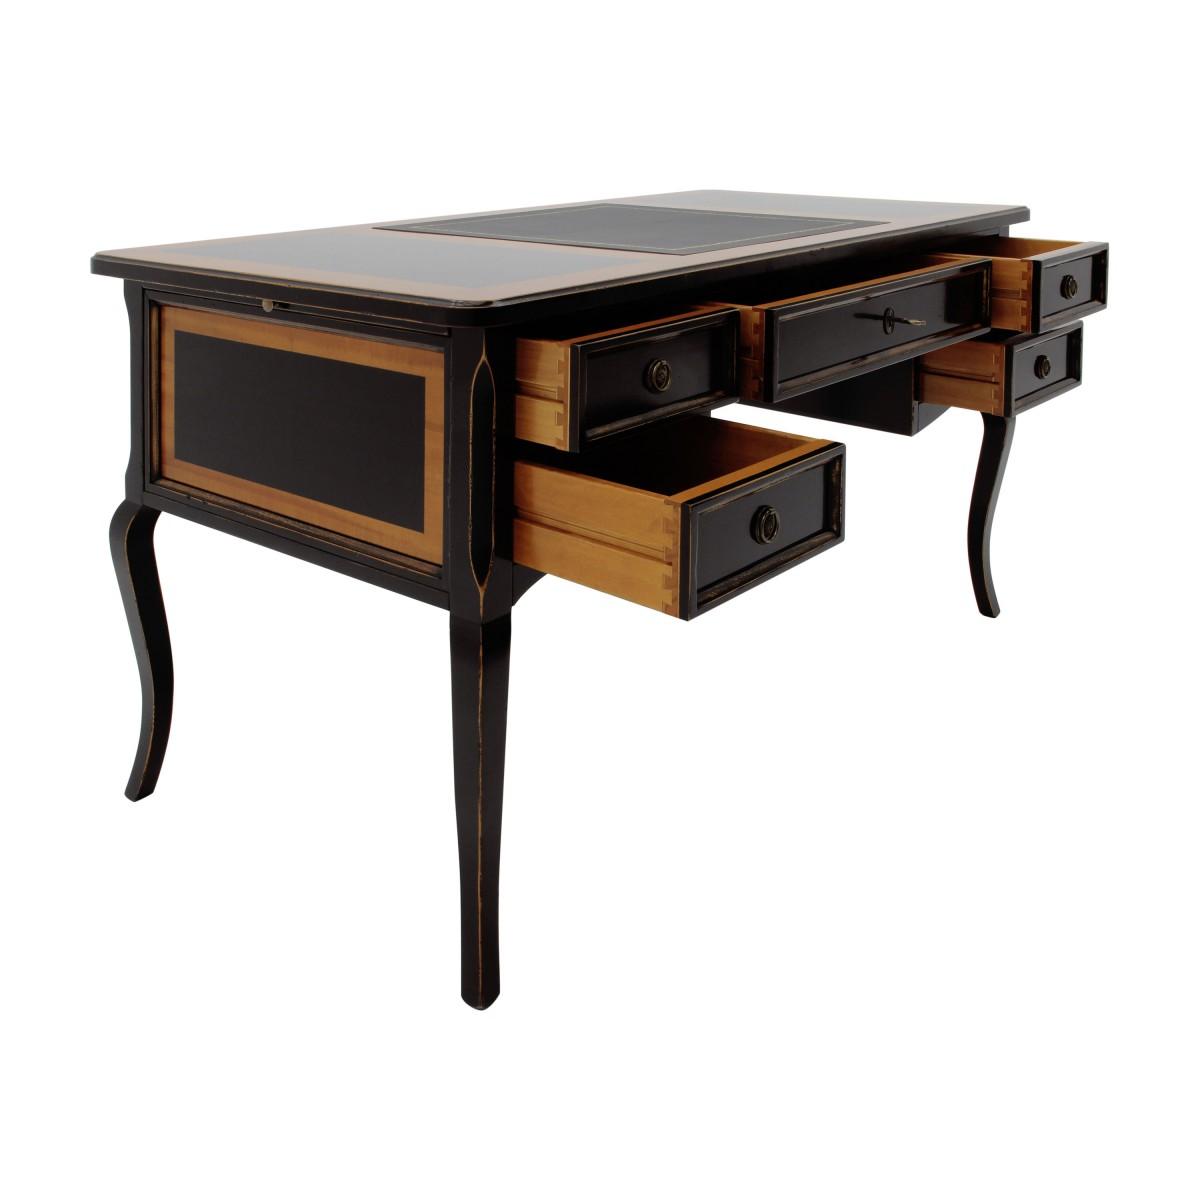 italian classic writing desk perseo 3 9327